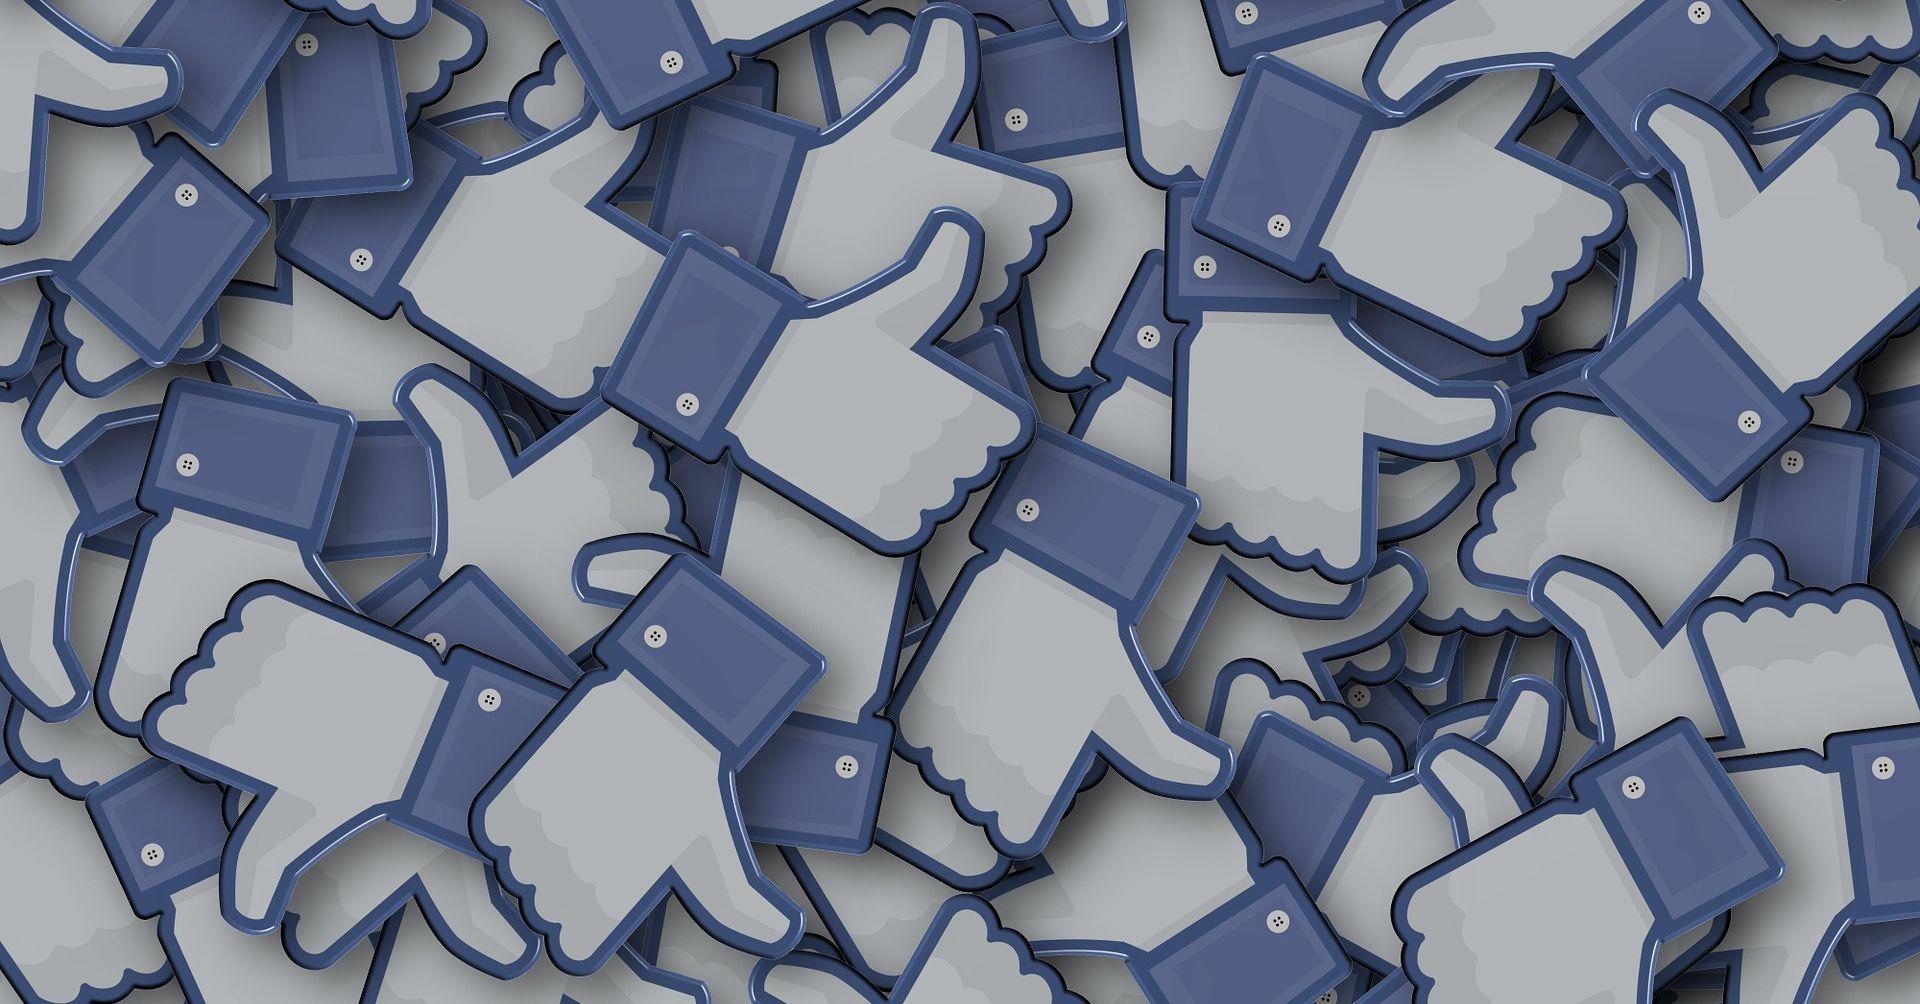 Prihodi Facebooka skočili 30 posto, broj korisnika i dalje raste